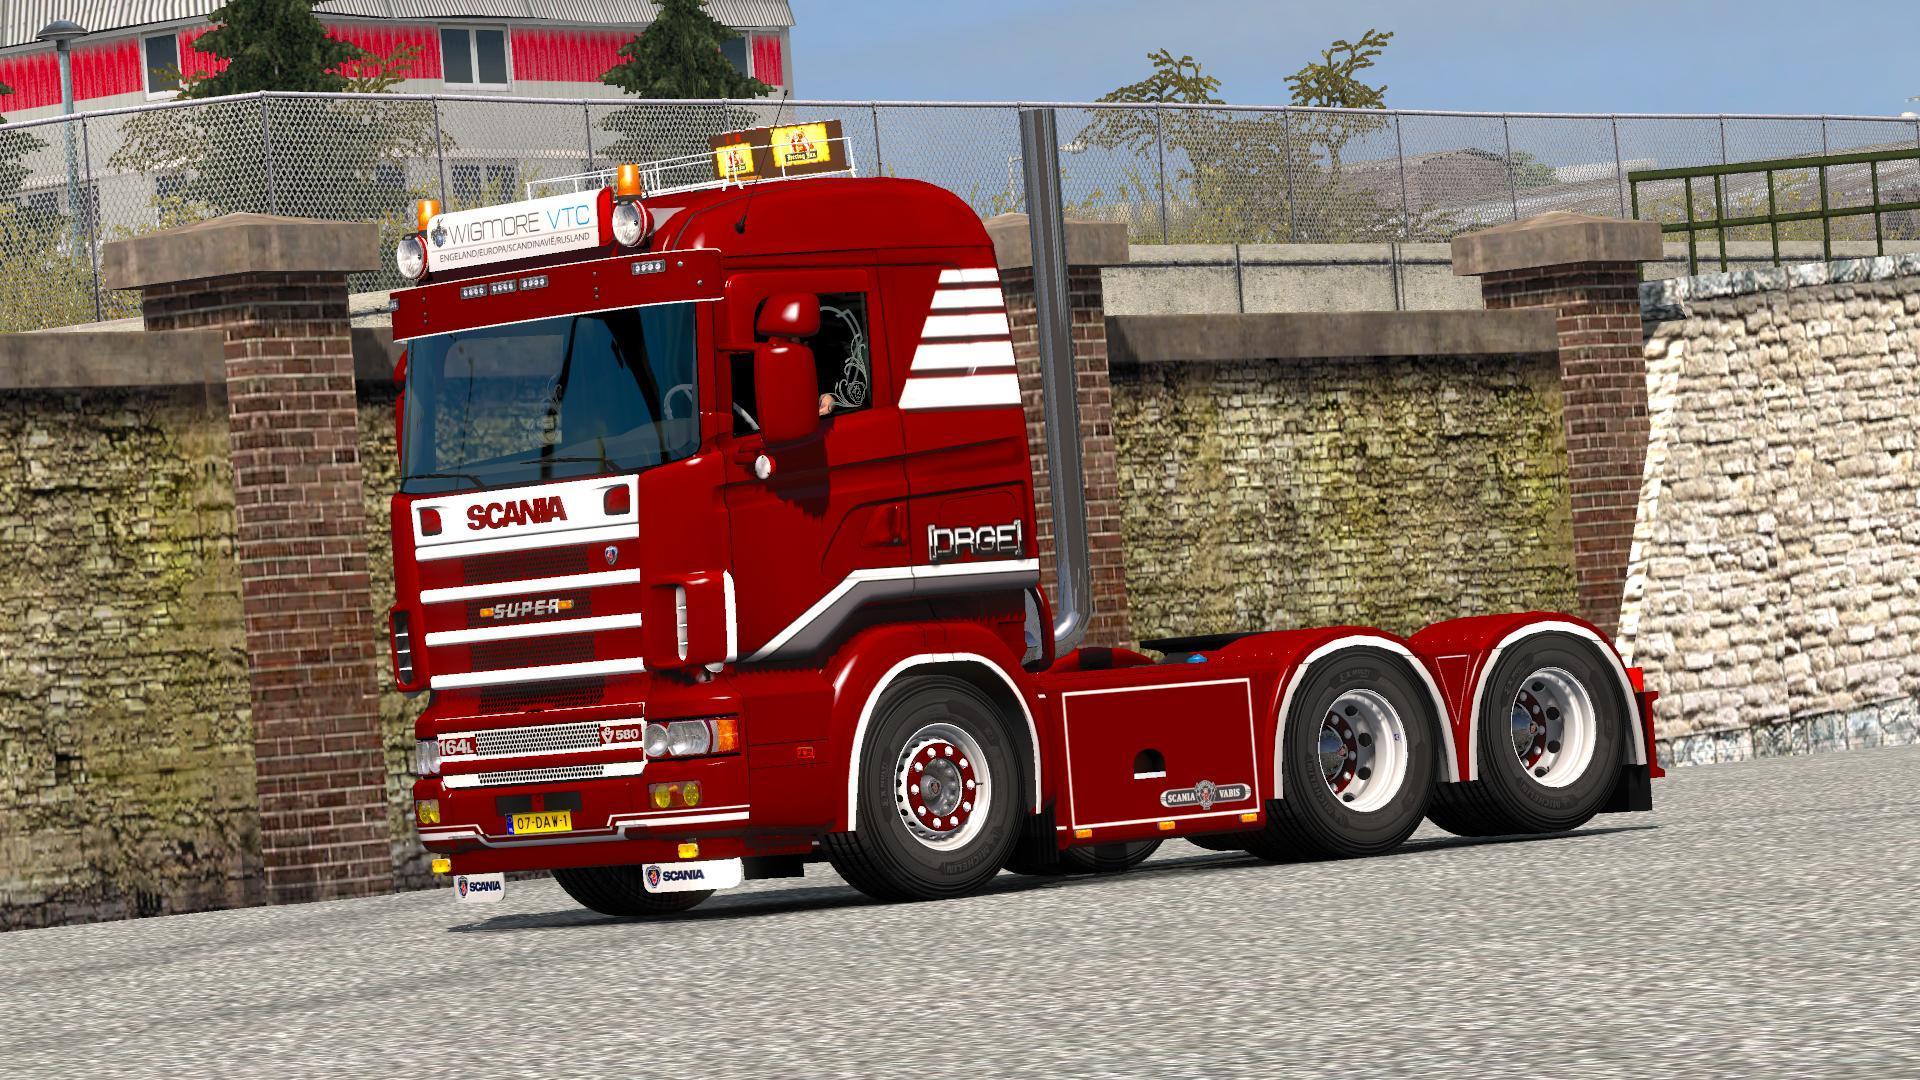 DRGE SKIN AND MOD TRAILERS V1.0 ETS2 -Euro Truck Simulator 2 Mods